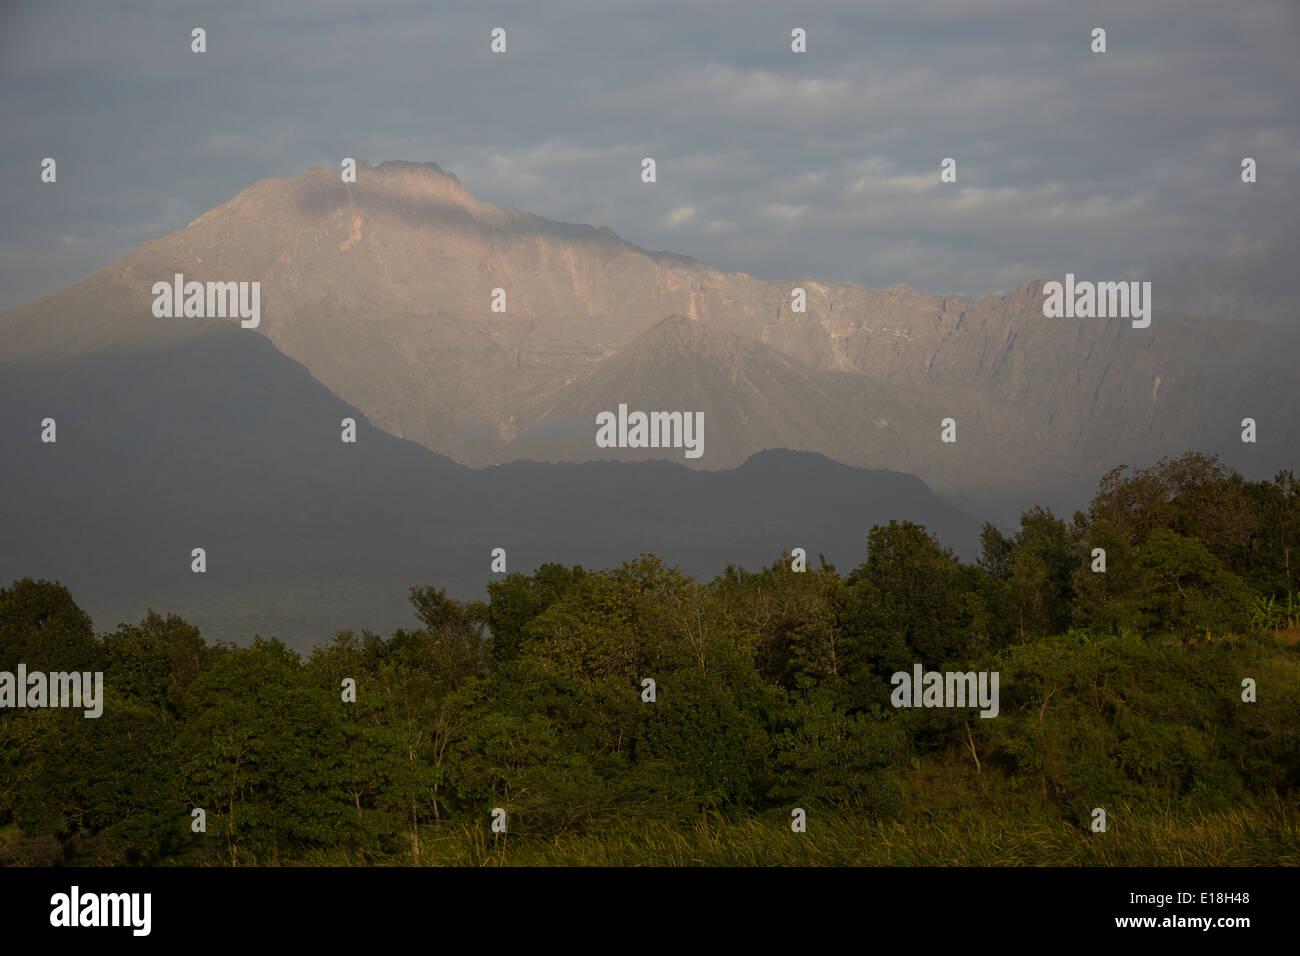 Mount Meru, Tanzania, East Africa - Stock Image